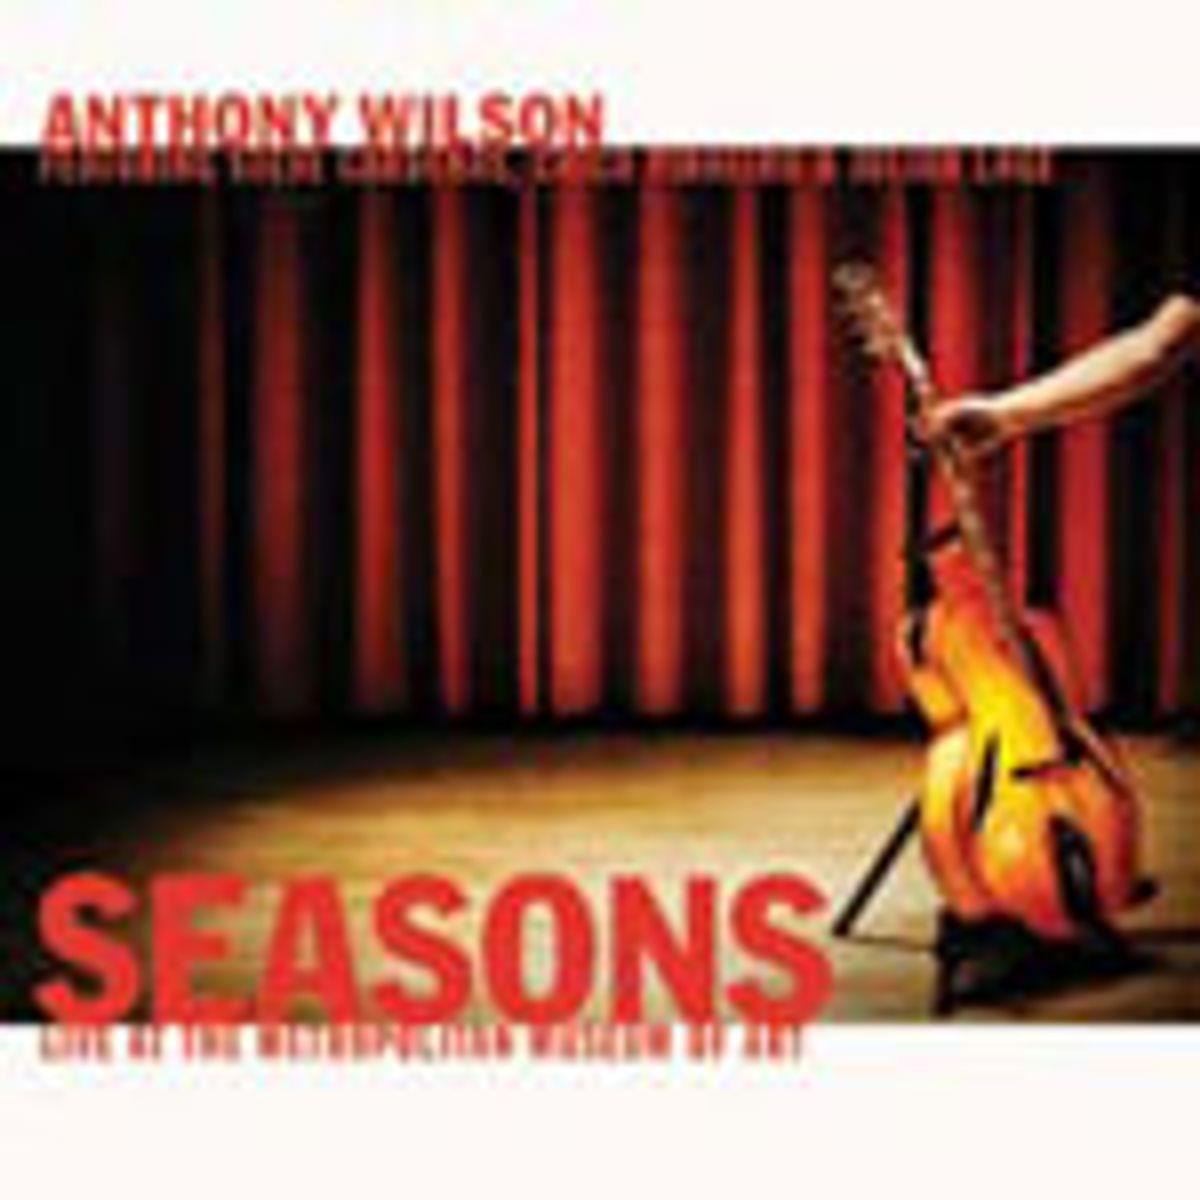 Album/DVD Review: Anthony Wilson - Seasons, Live at the Metropolitan Museum of Art